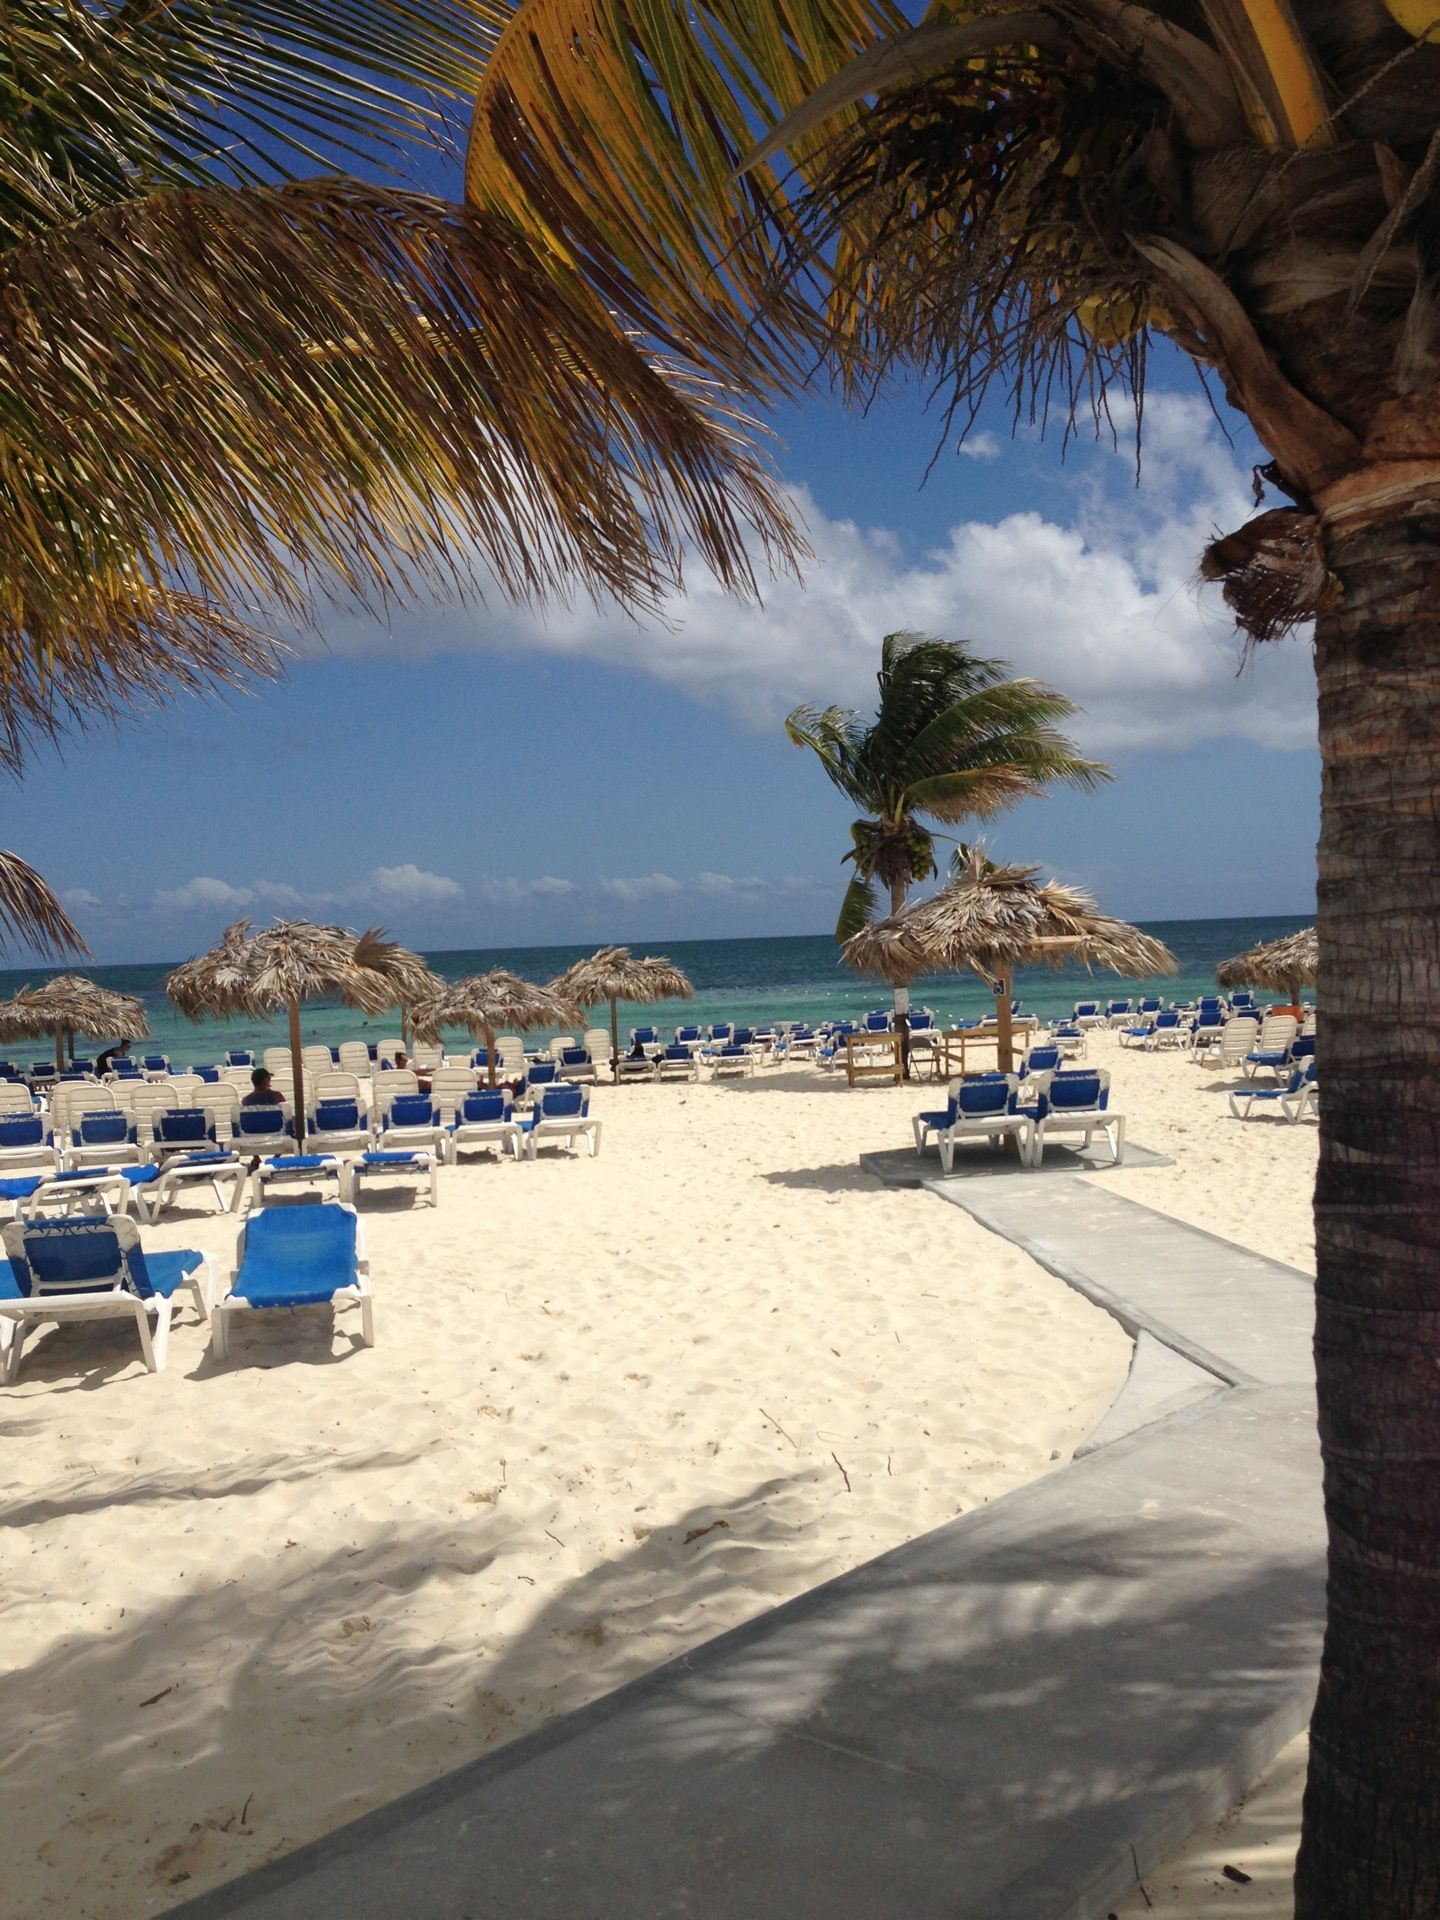 Viva Wyndham Fortuna Beach In Freeport Grand Bahama Island